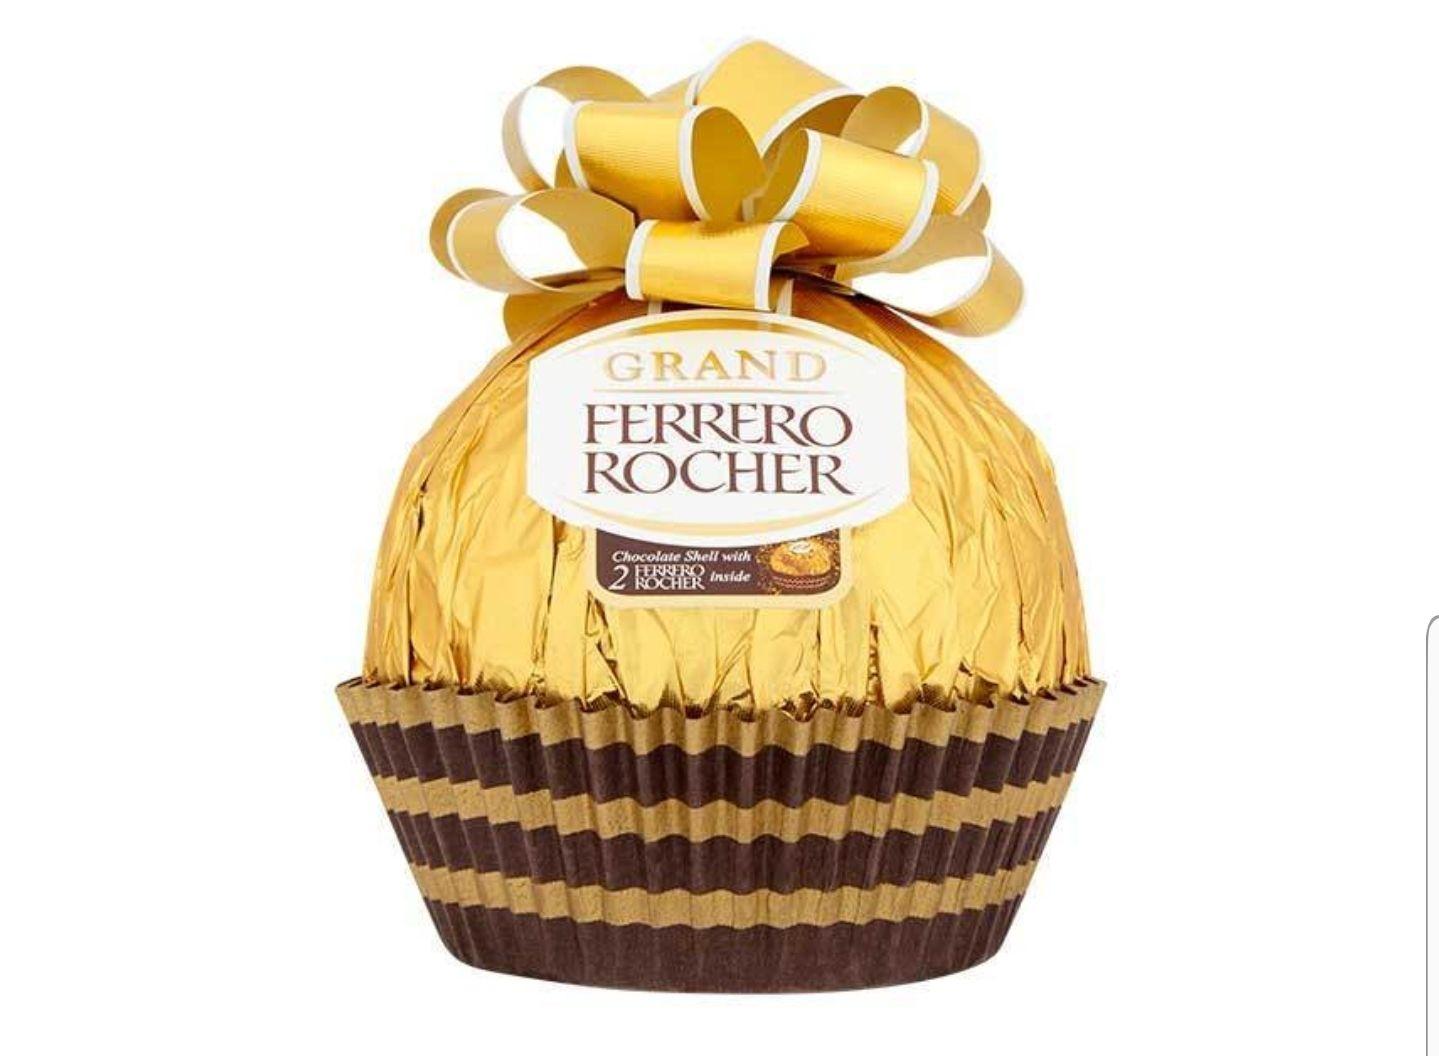 Grand Ferrero Rocher Chocolate 125g £2.49 @ Superdrug